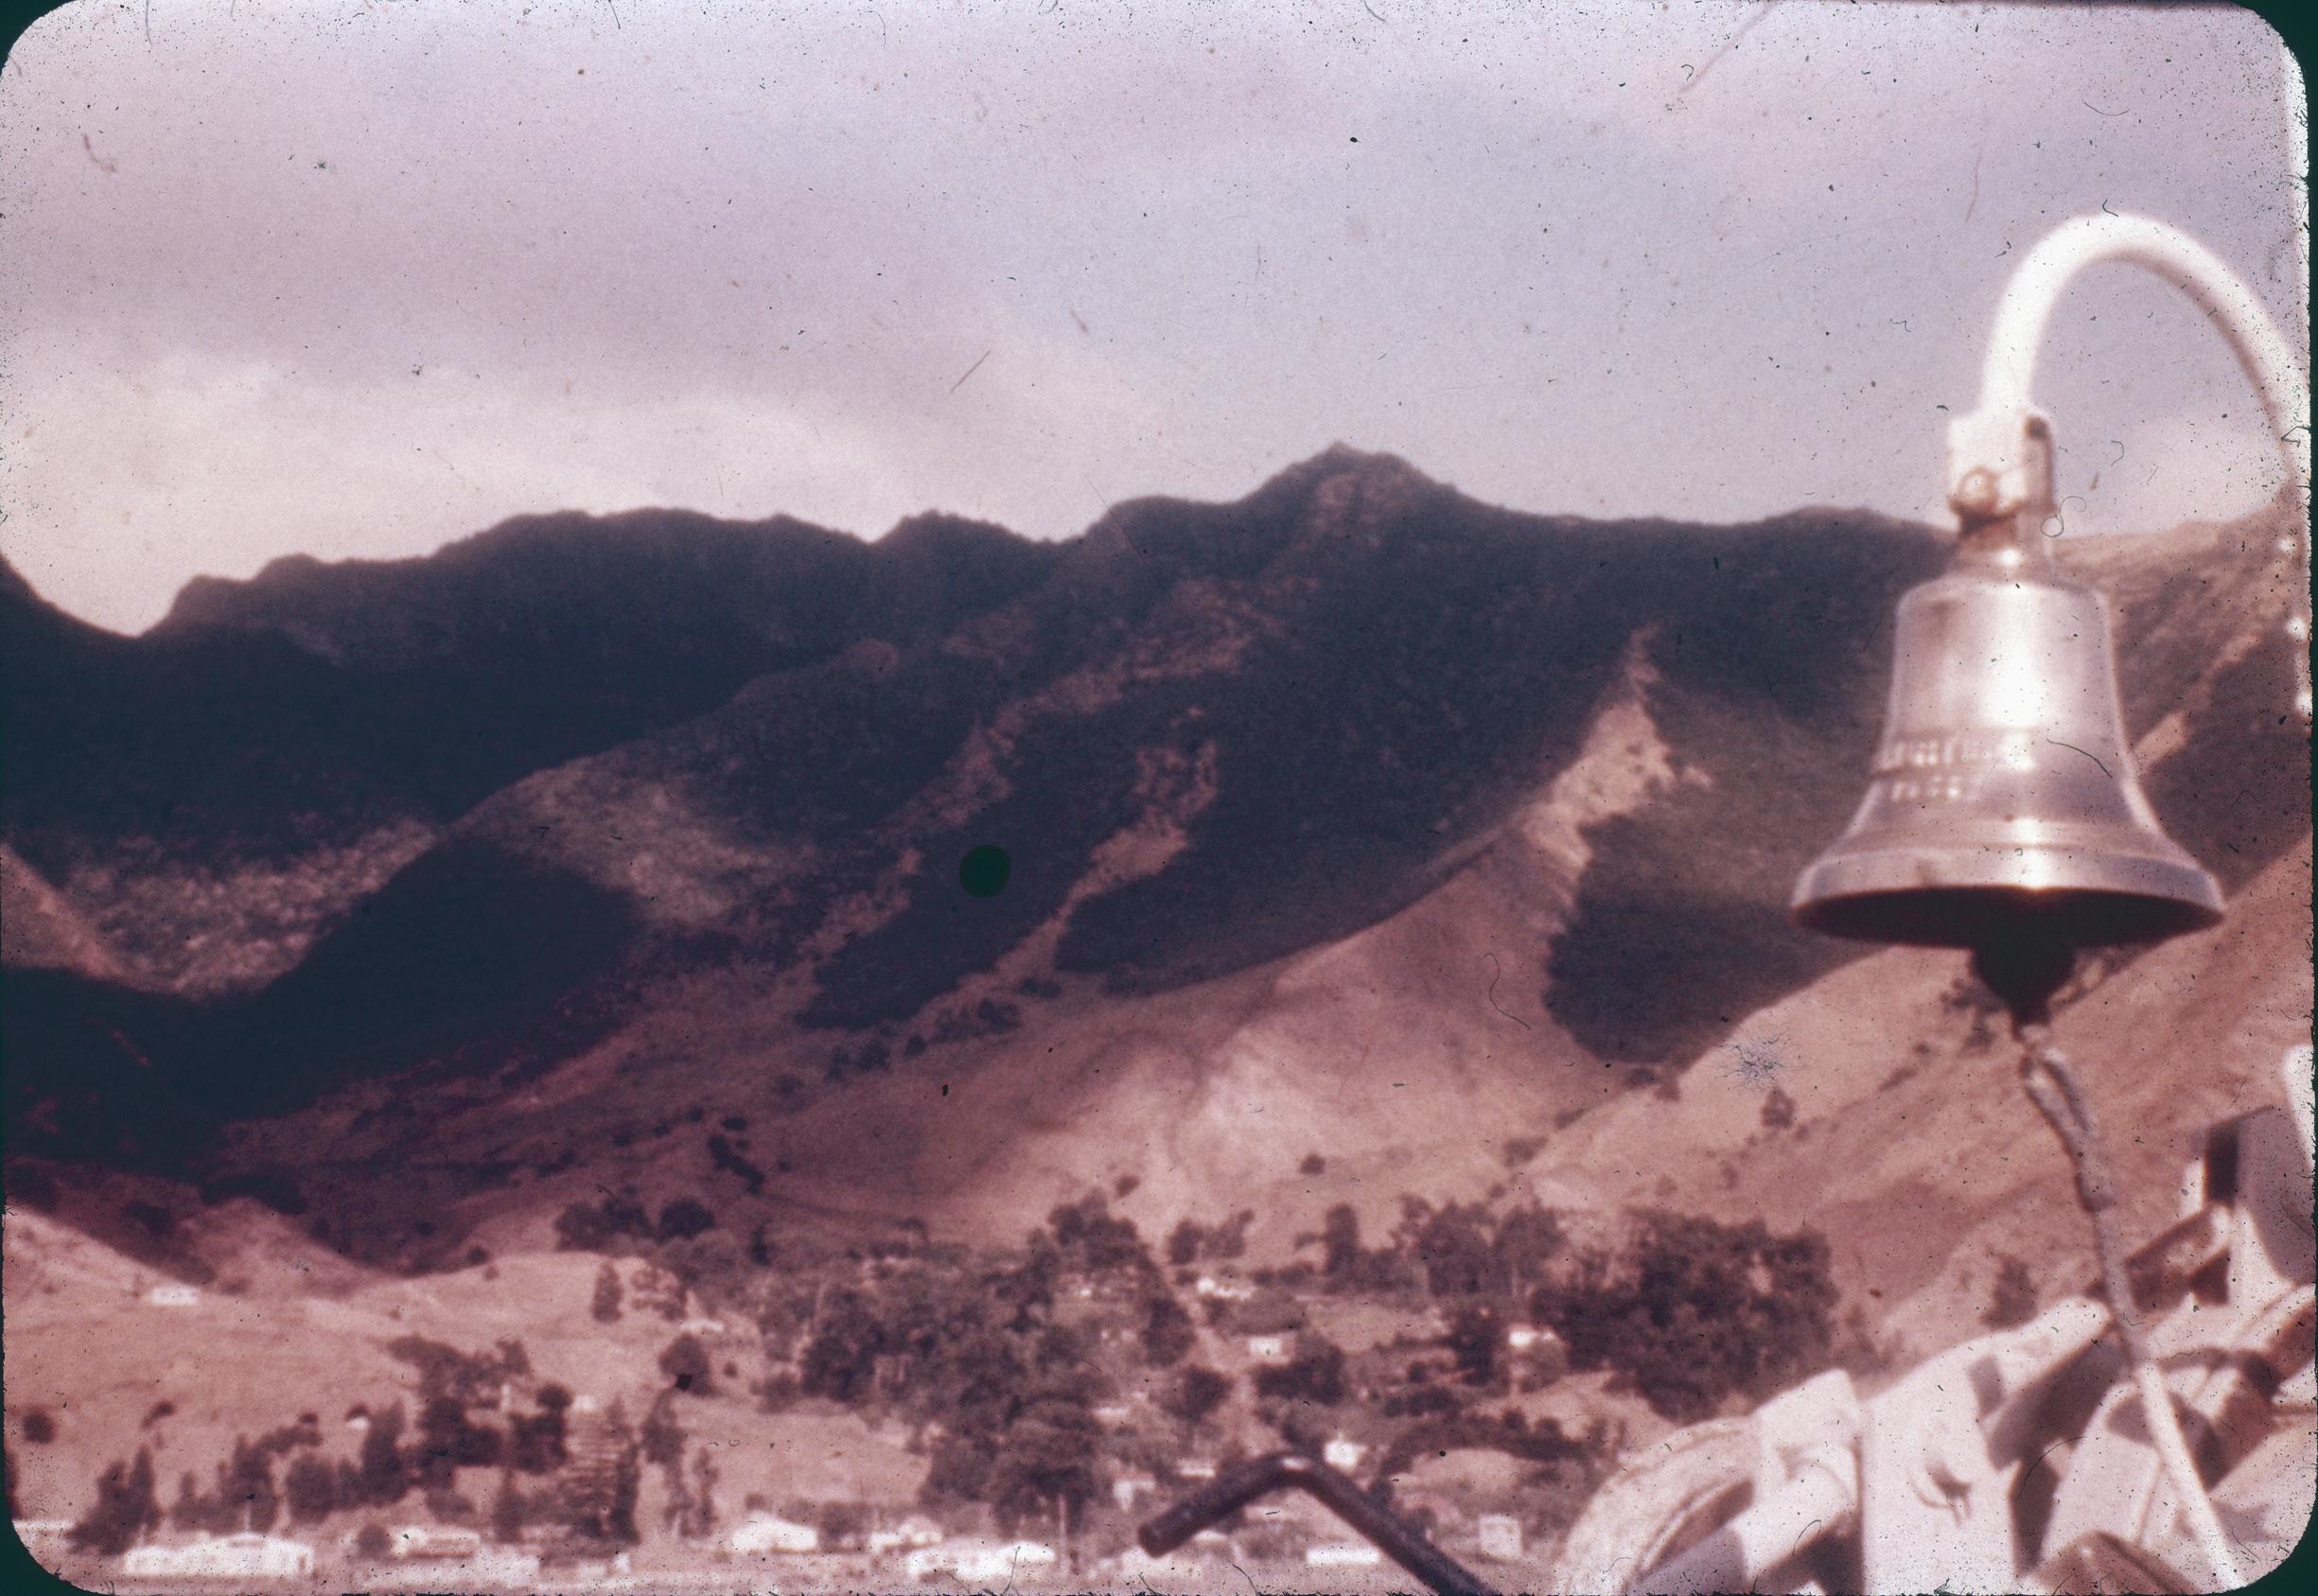 Enterreno - Fotos históricas de chile - fotos antiguas de Chile - Isla de Robinson Crusoe, Archipiélago de Juan Fernandez, 1960